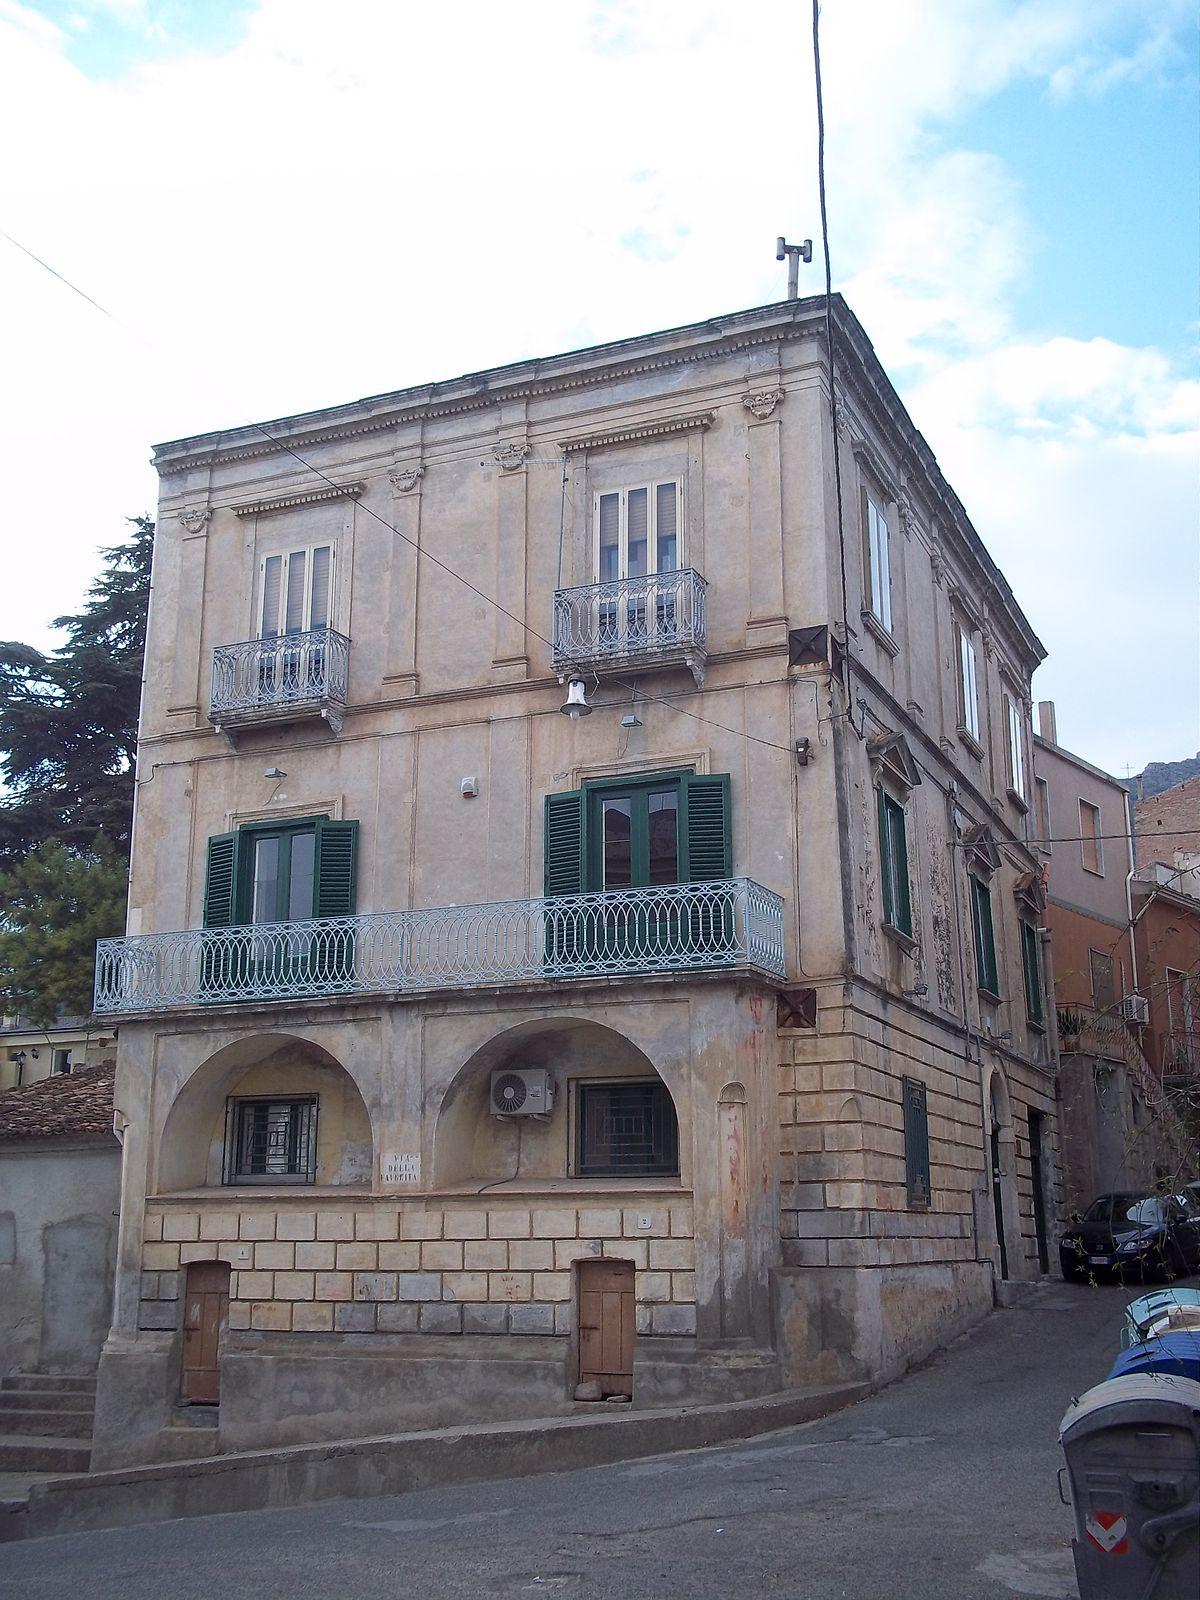 Palazzo Viafora  Wikipedia